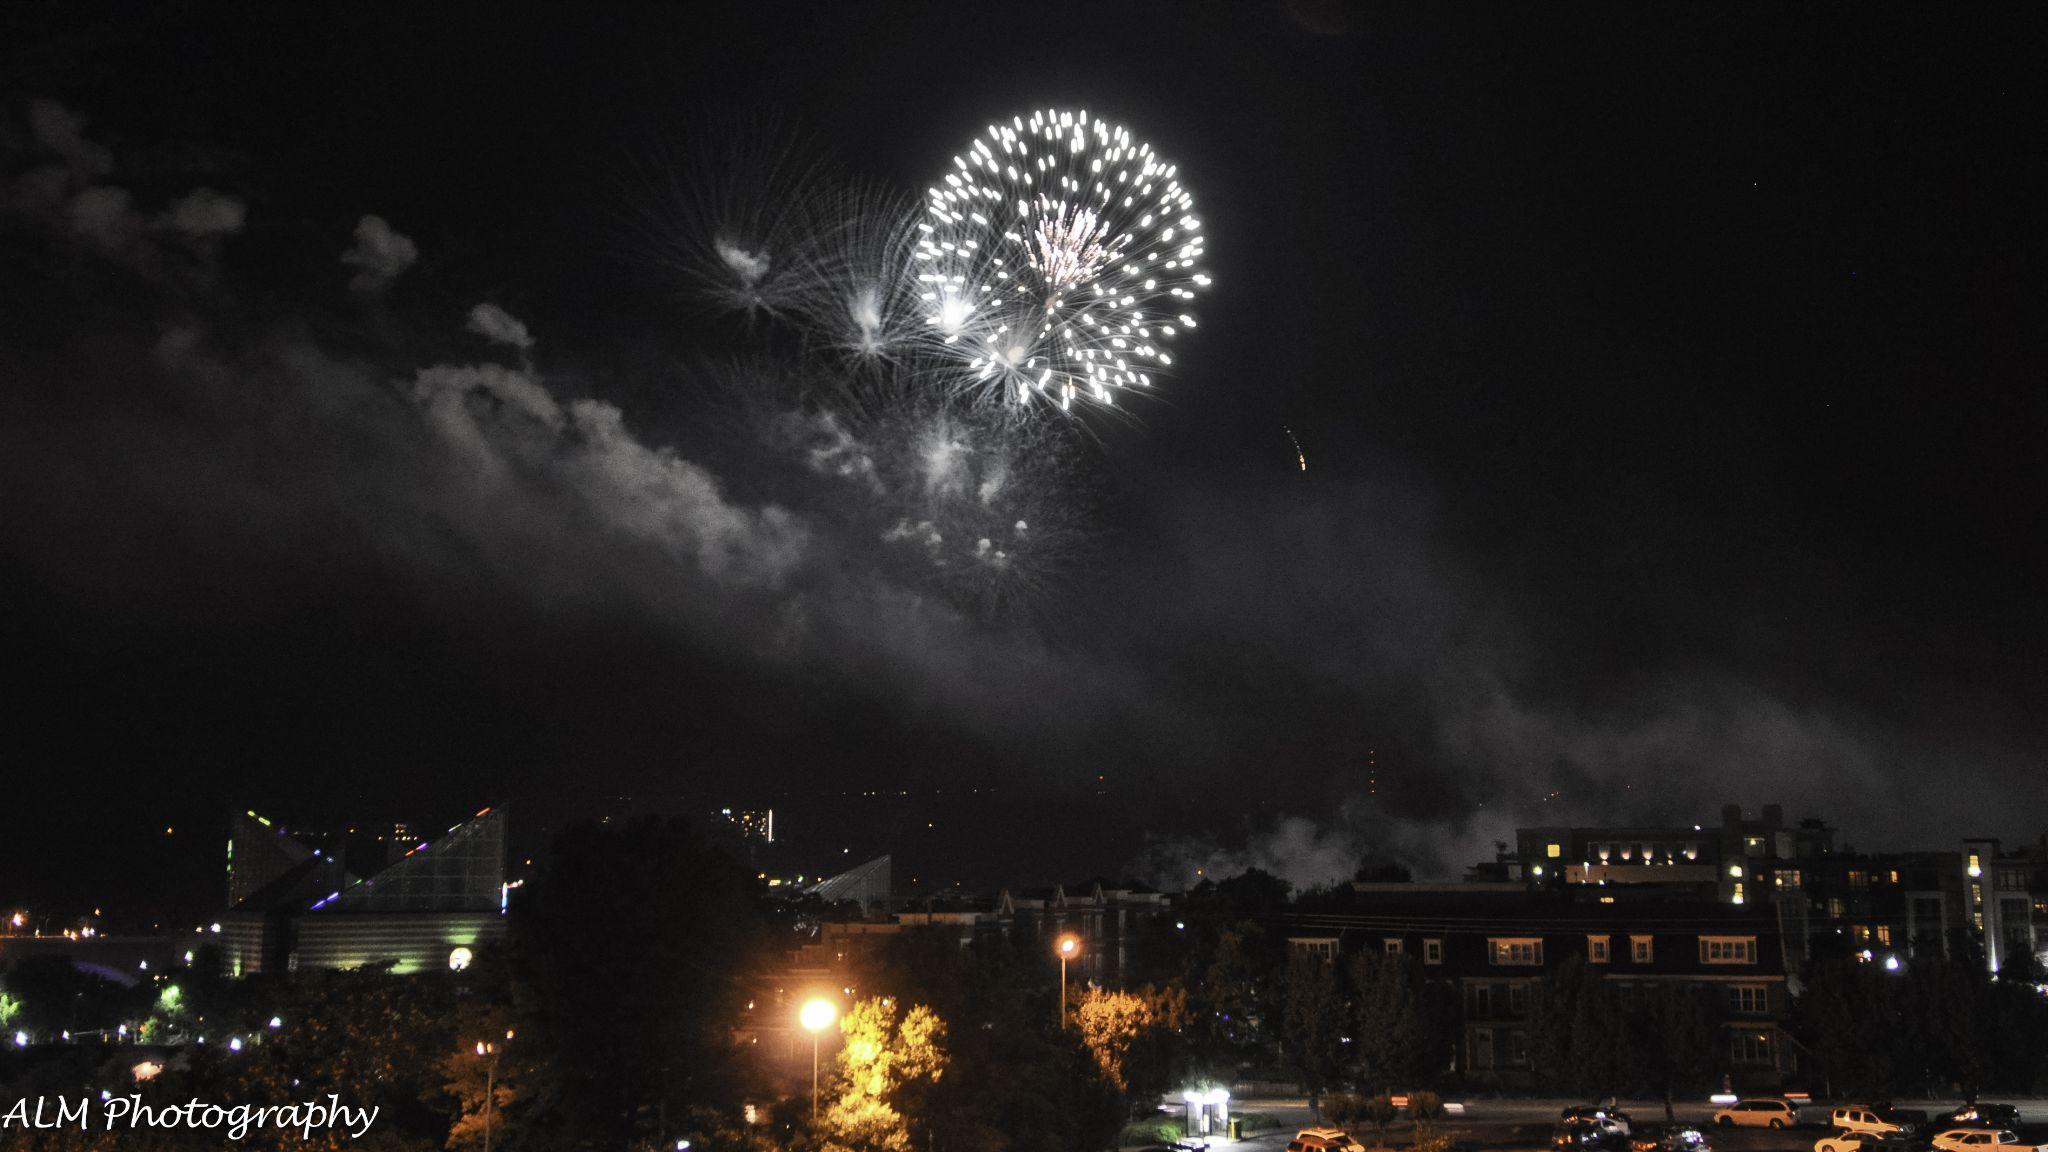 Riverbend Fireworks 2014 - DSC_0655 by adamlmassey